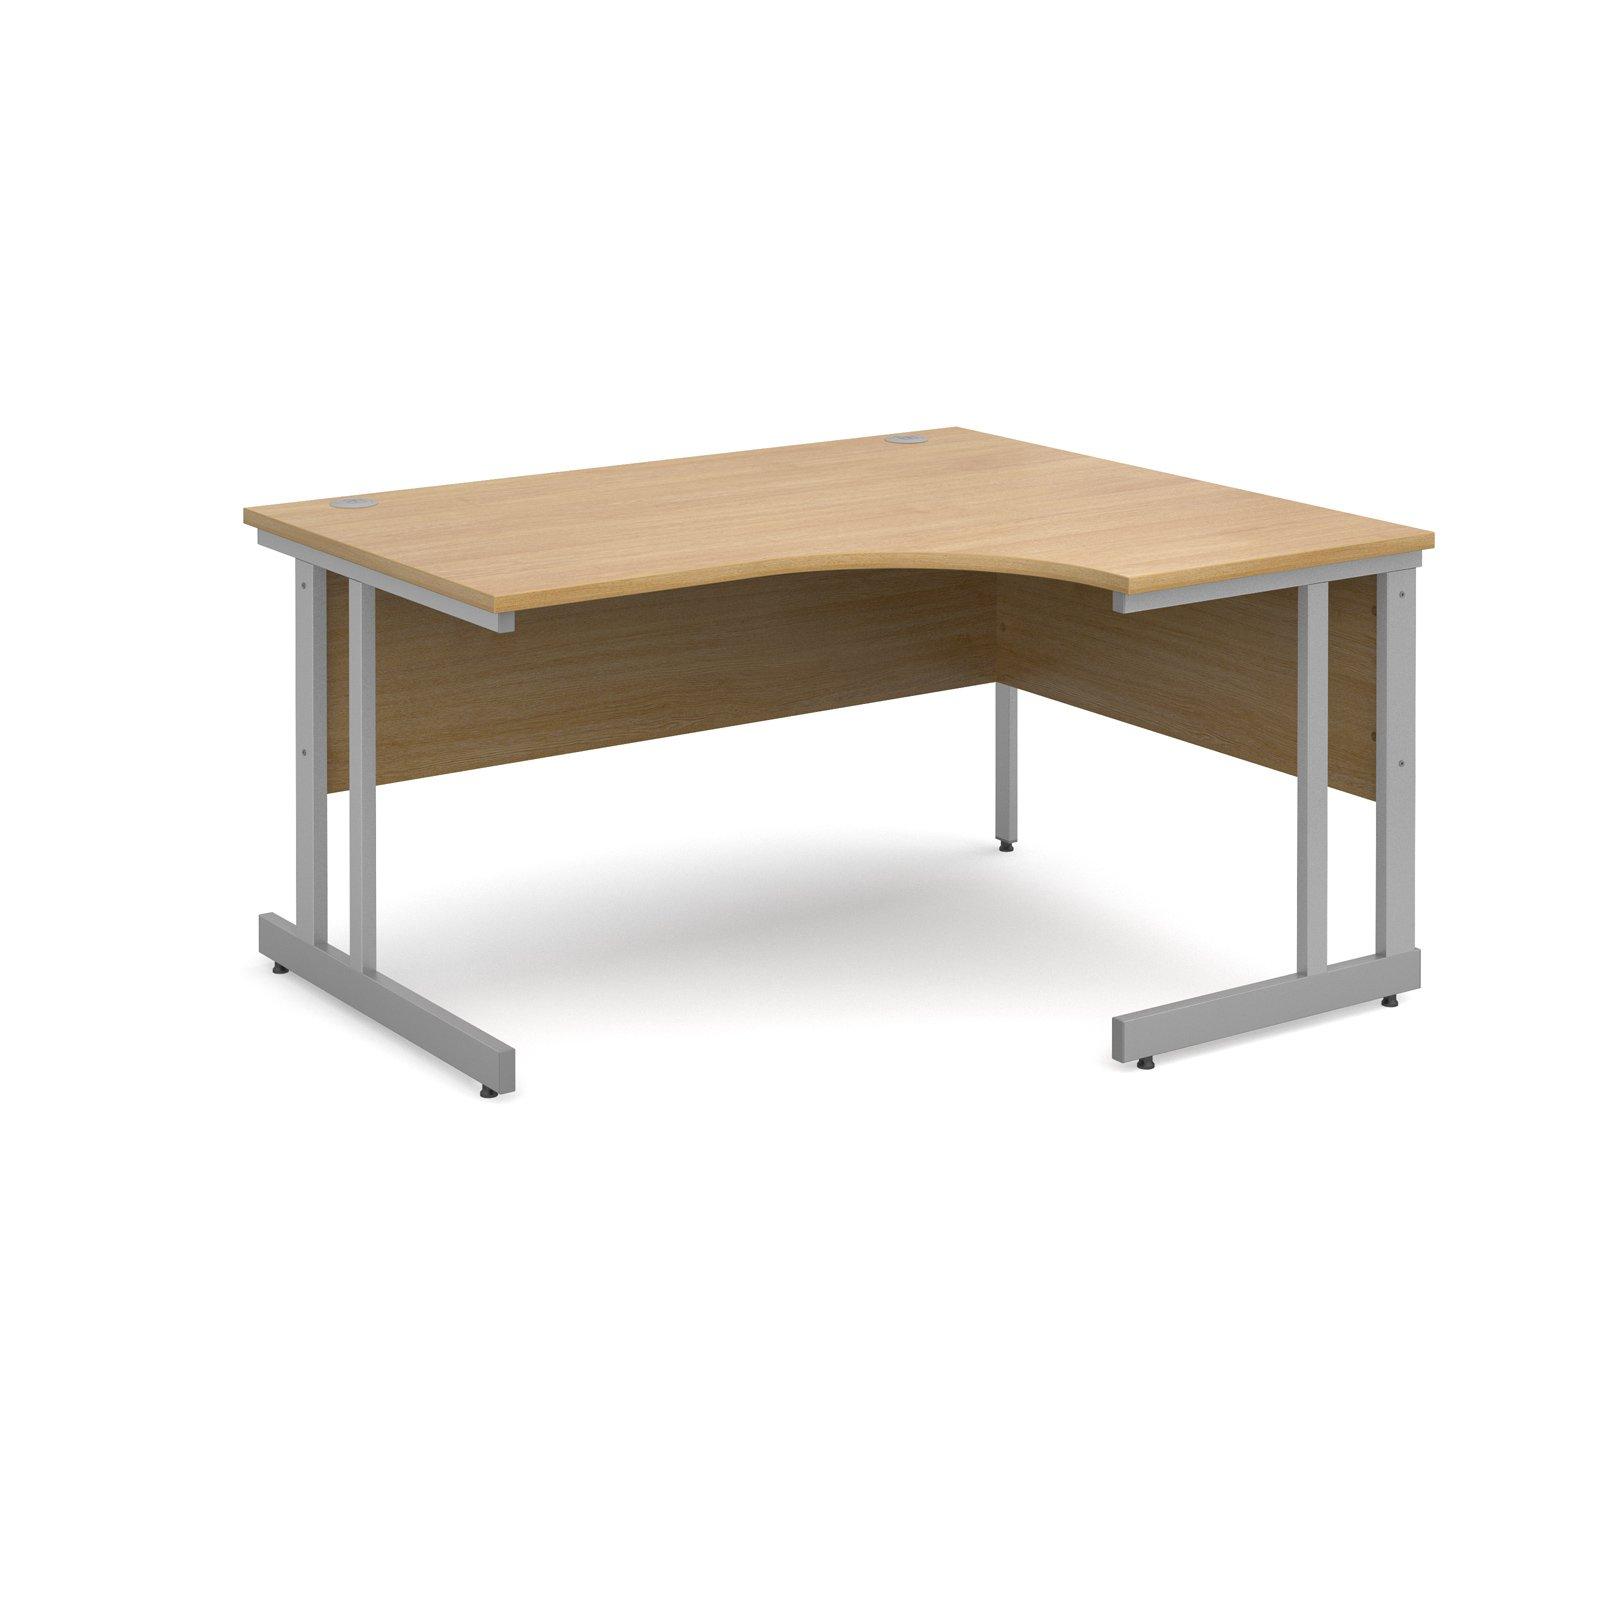 Momento right hand ergonomic desk 1400mm - silver cantilever frame, oak top